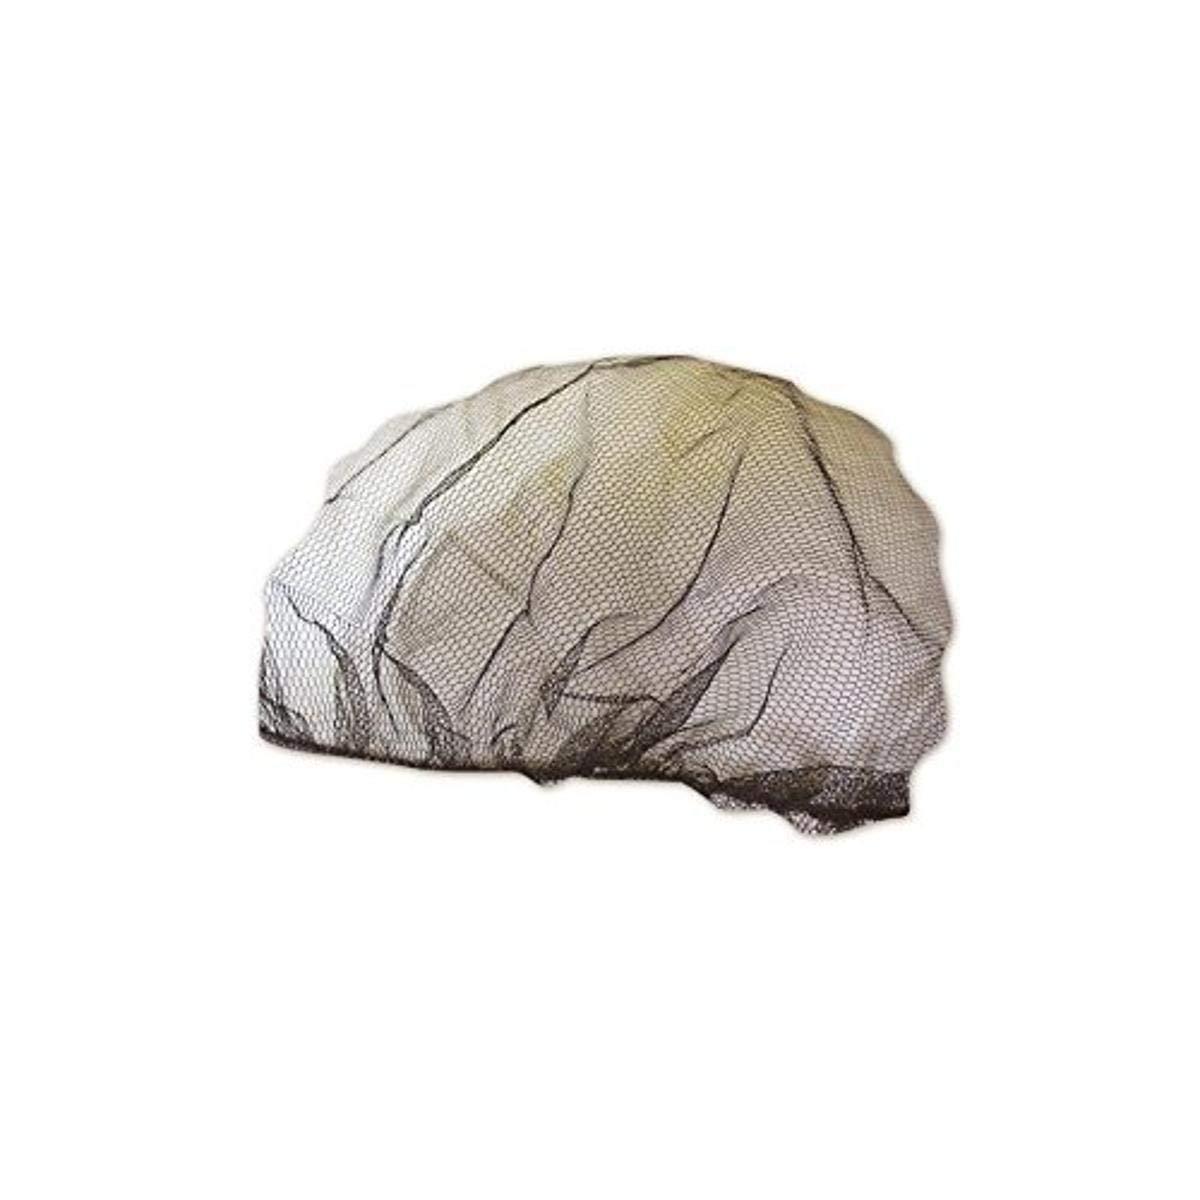 Keystone 109I-REG-DKBROWN Adjustable Cap Co Dark Brown Invisible Denier Hair Net, Blue, 22